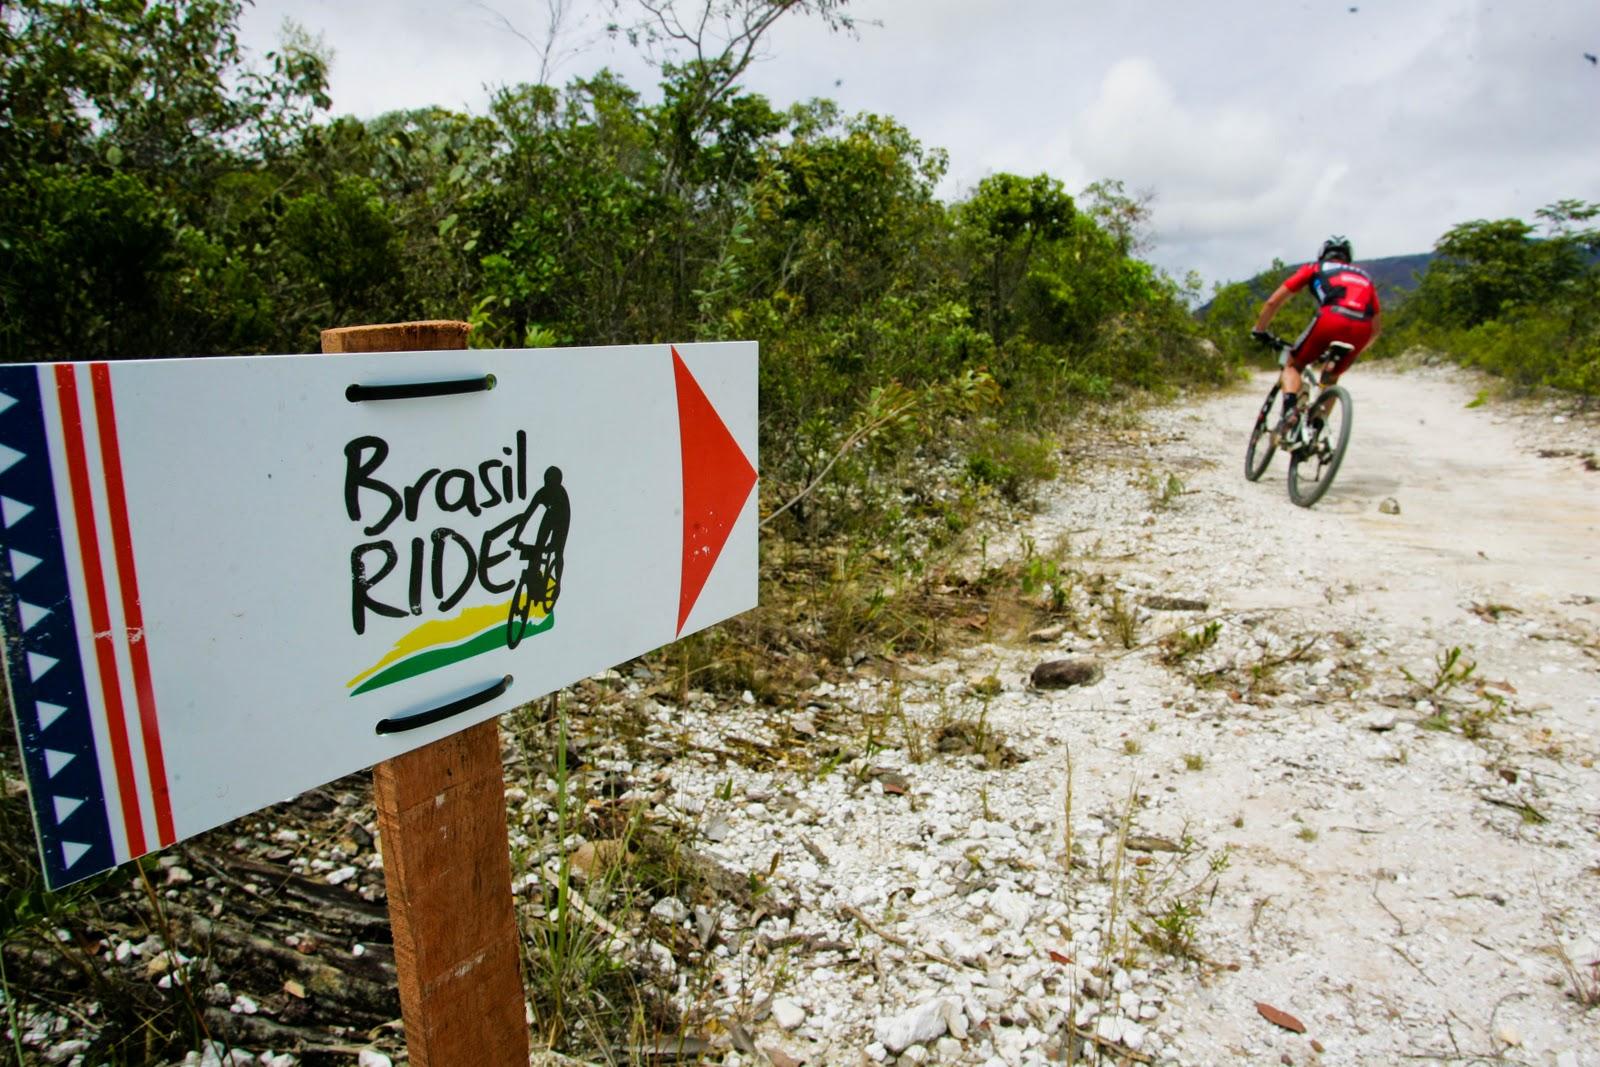 Brasil Ride Fuente:  www.waltertuche.com.br